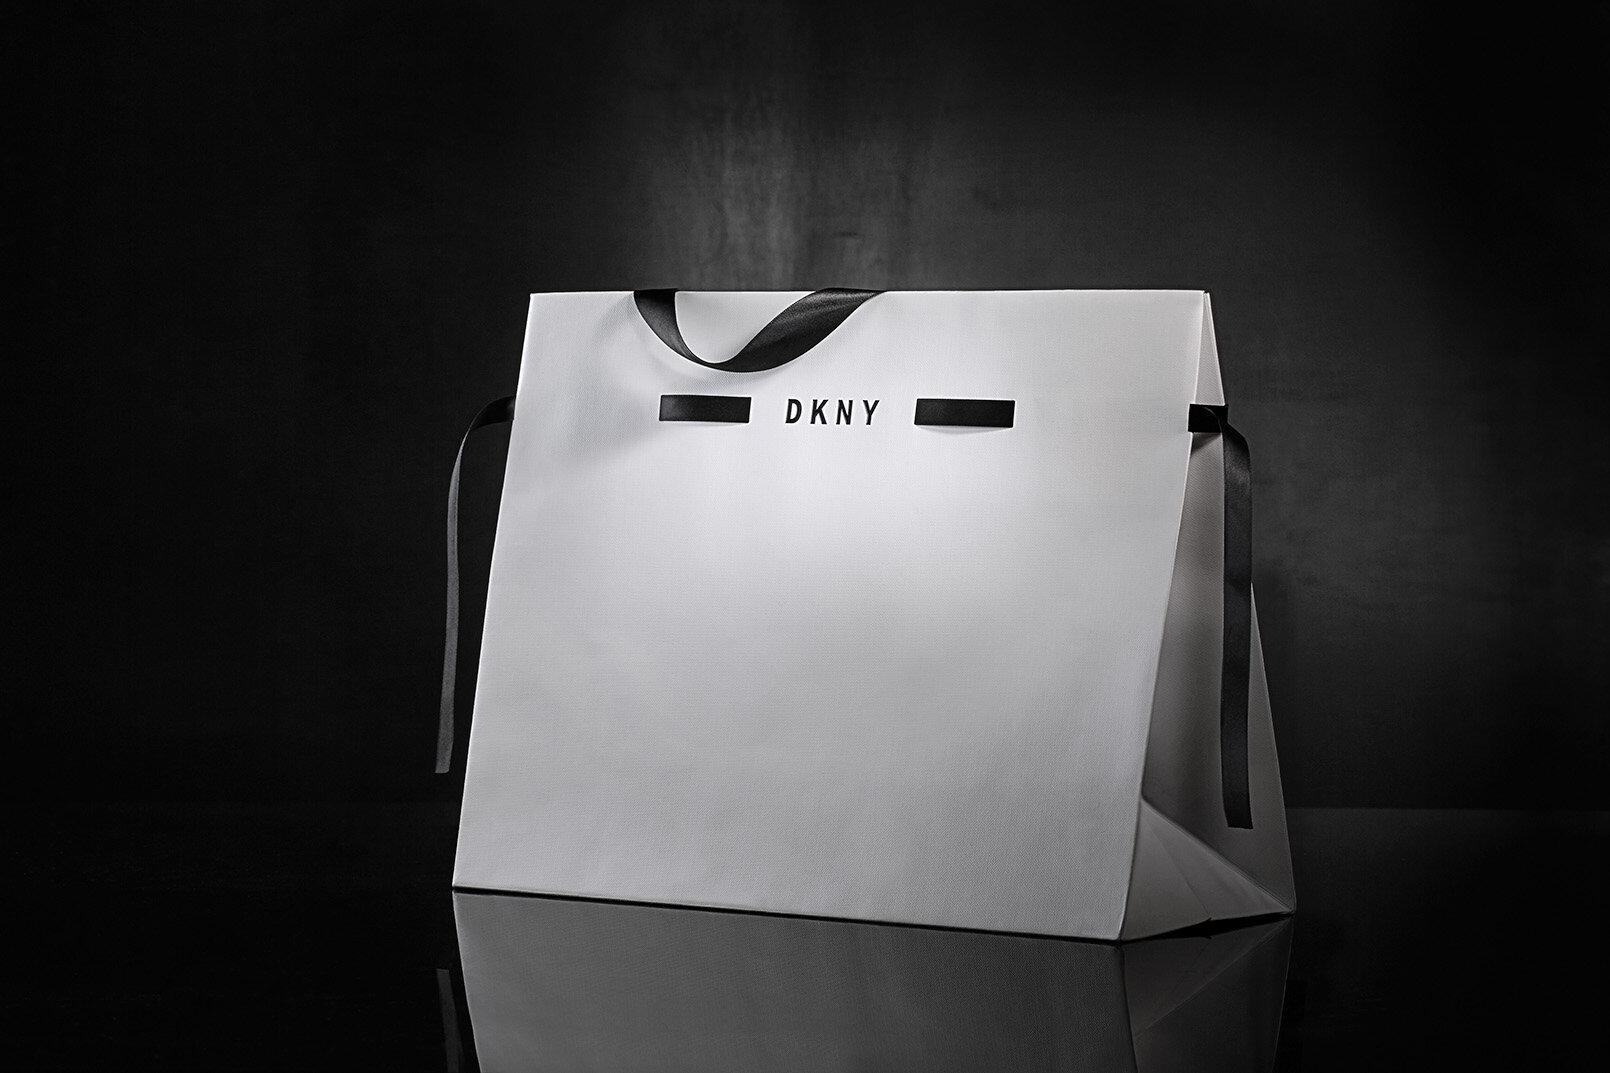 dkny_ribbon_closure_cinching_retail_design_packaging_co.jpg.